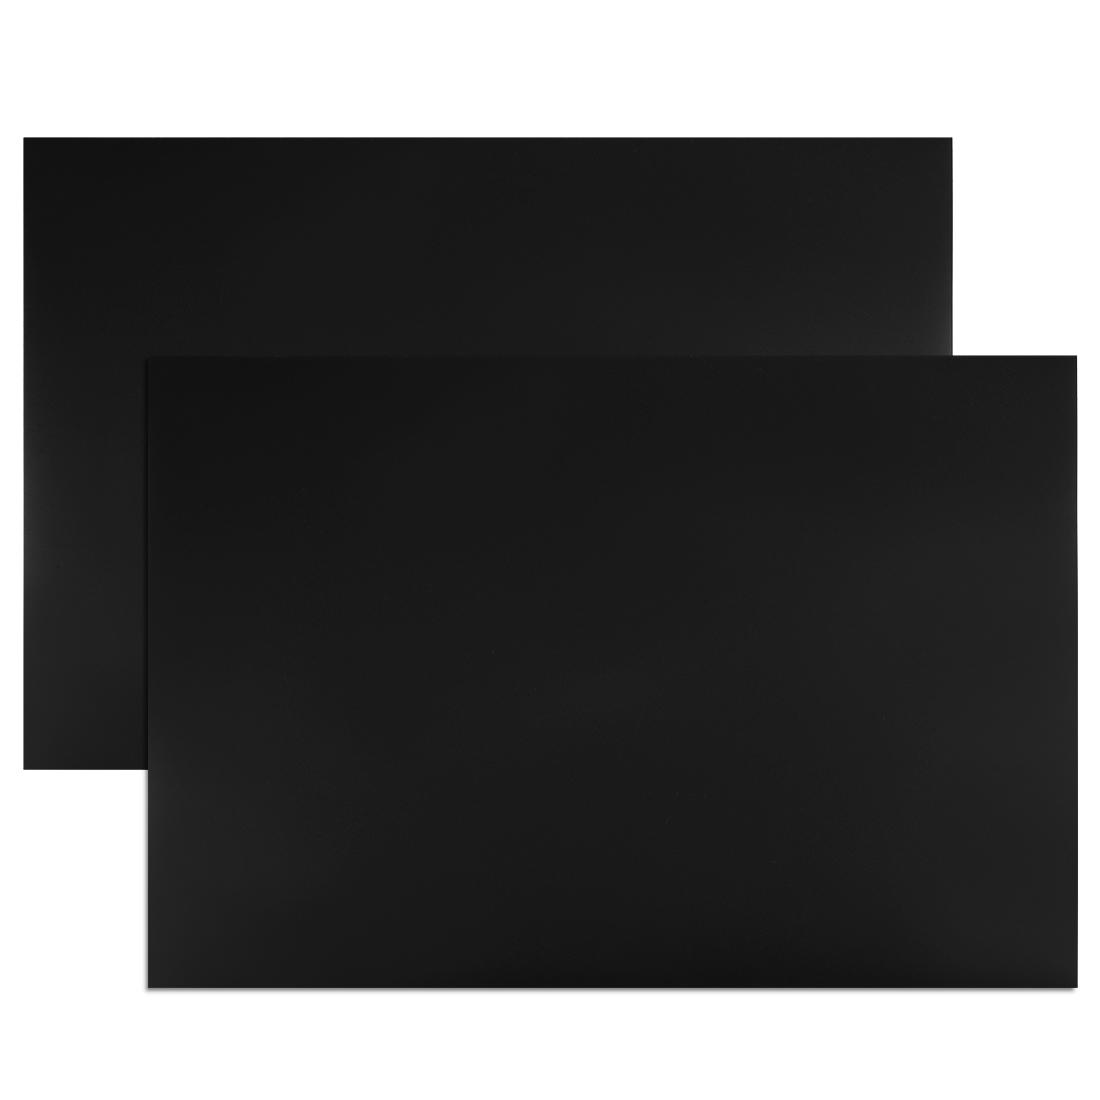 "2 Pcs Dry Erase Flexible Magnetic Strip 11.7"" x 8"" Stickers Writable Black"